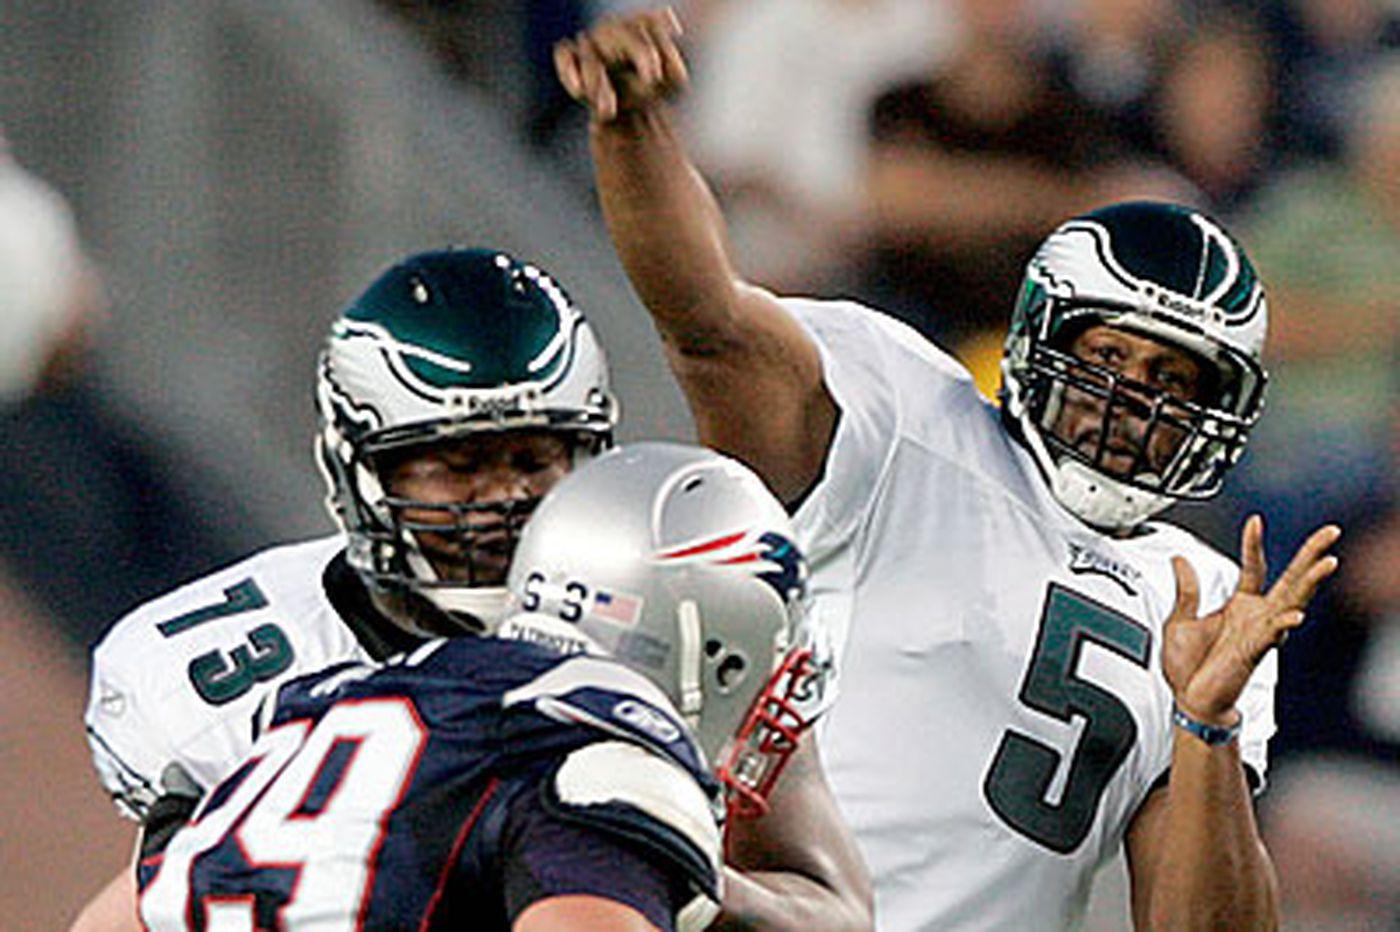 Eagles - Jackson, Demps help spark Eagles' win over Patriots